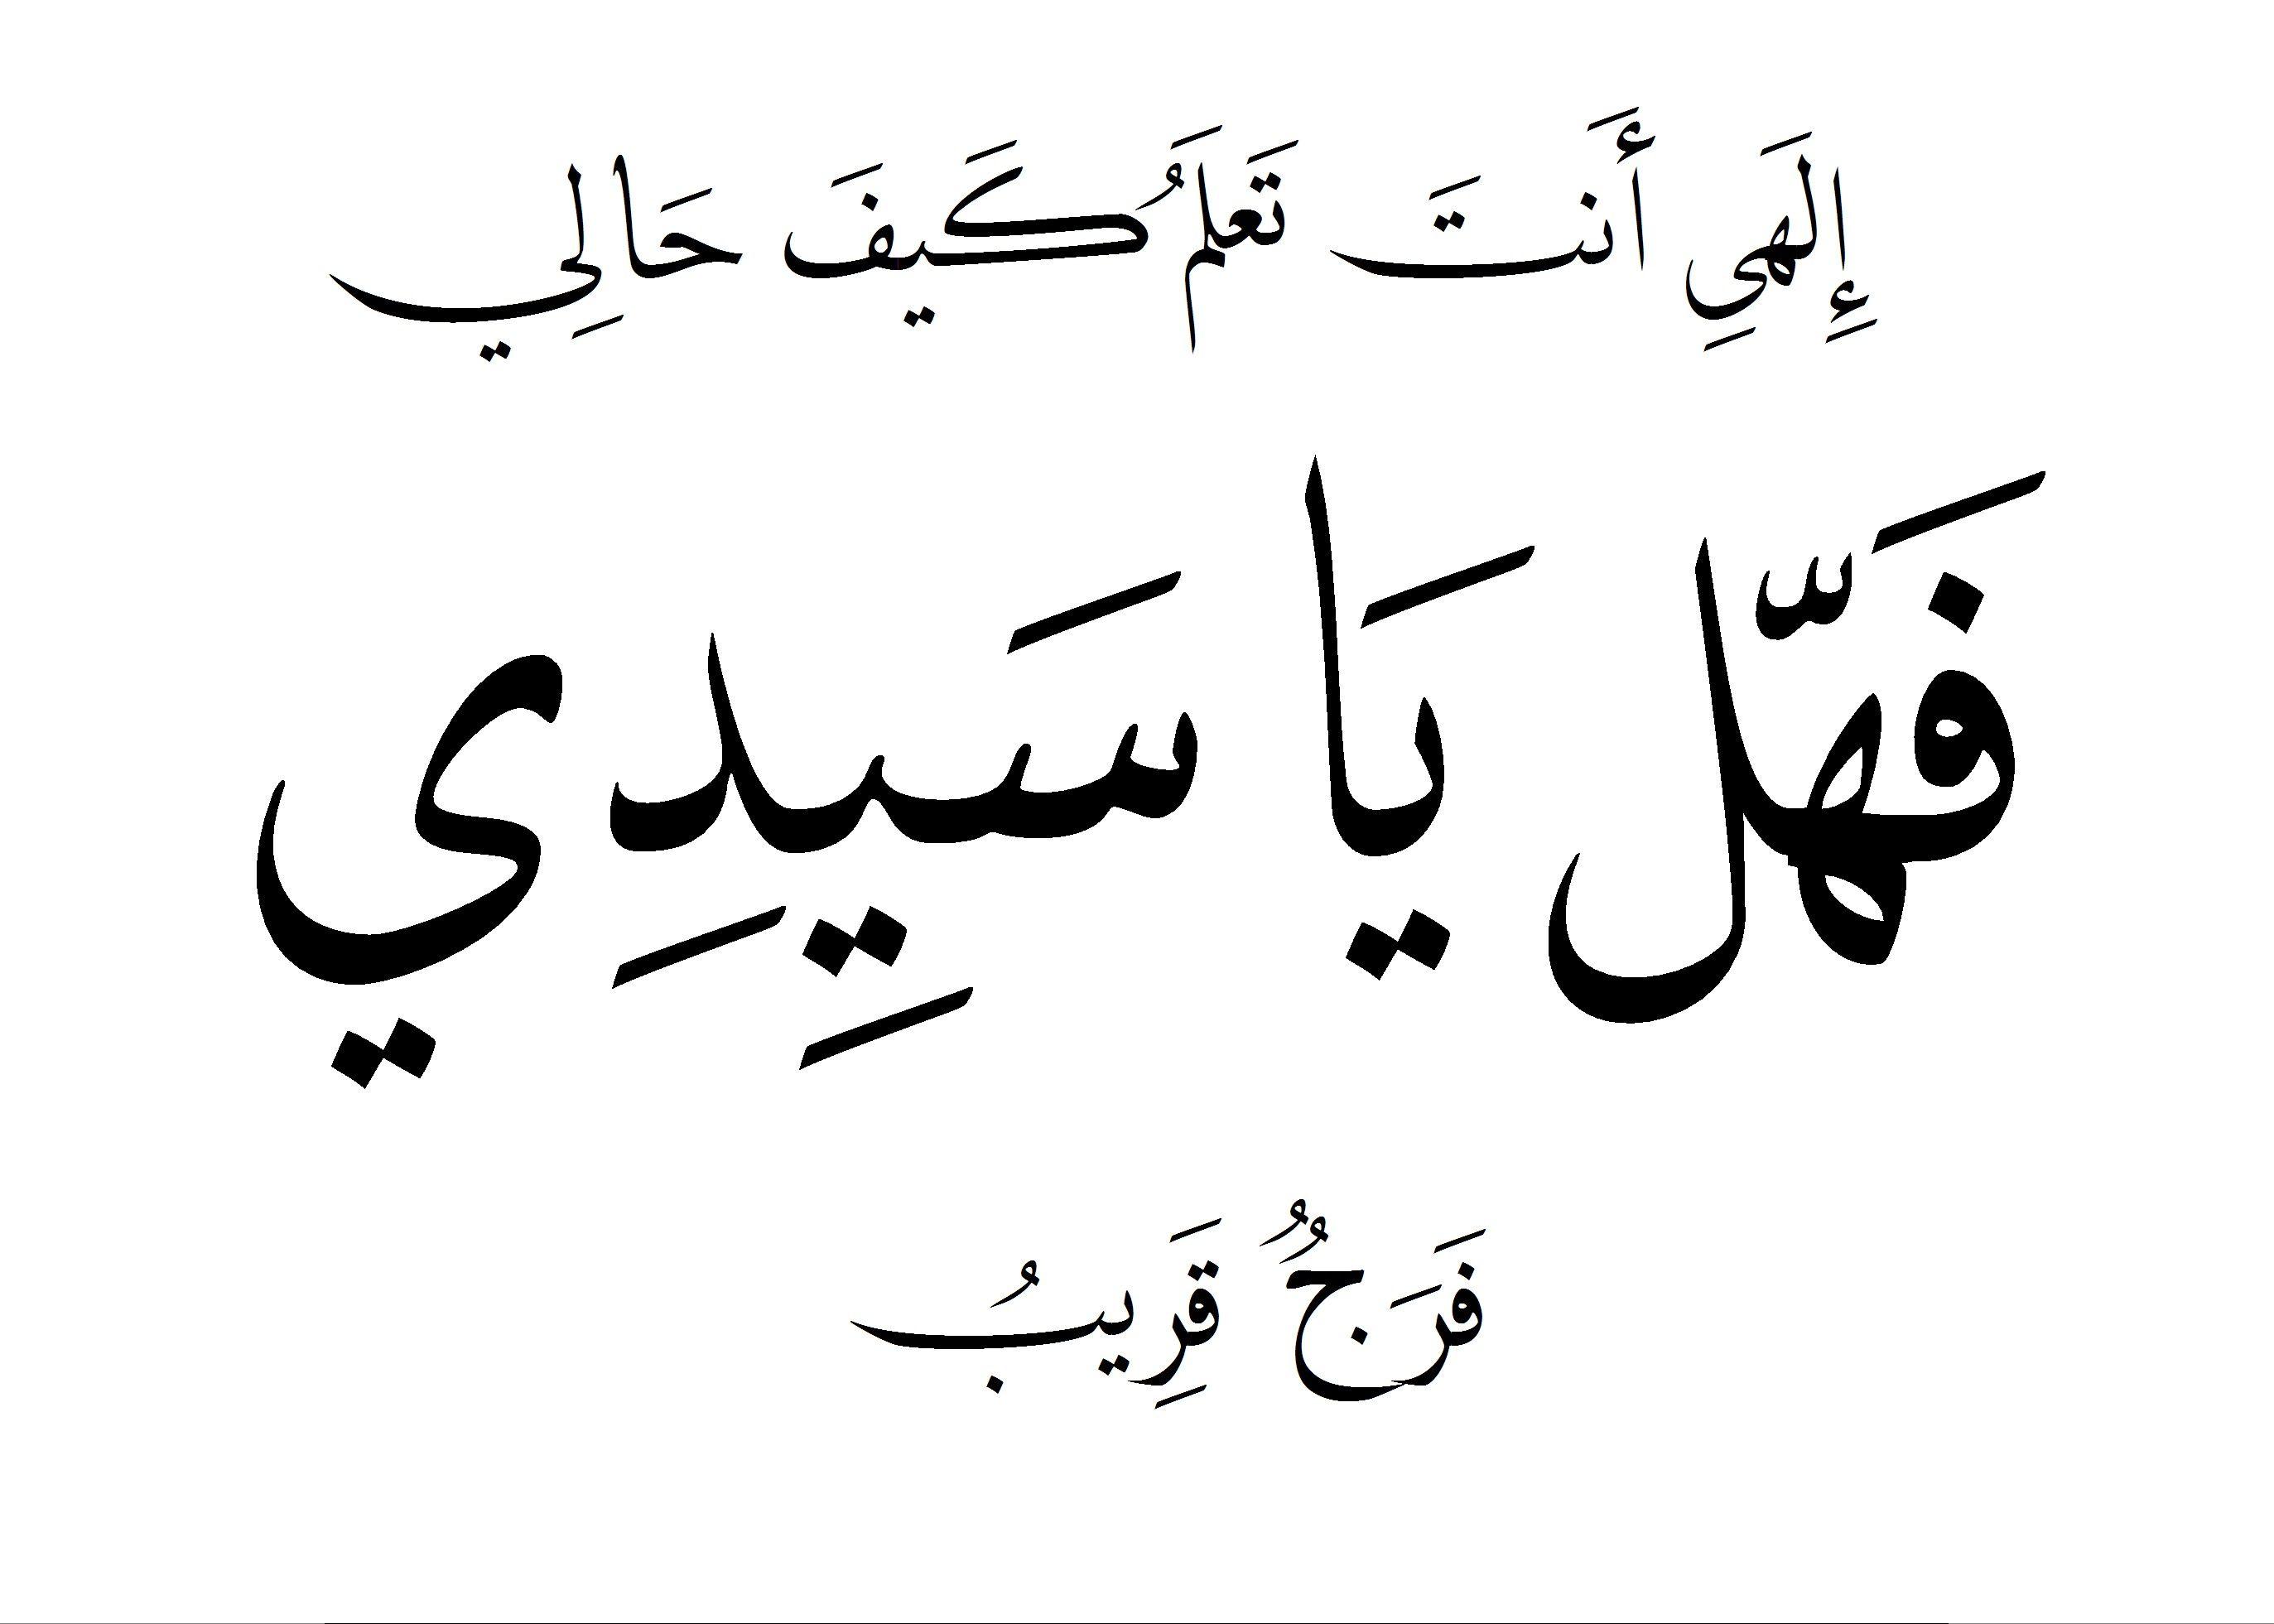 فهل يا سيدى فرج قريب Islamic Quotes Quotes Holy Quran